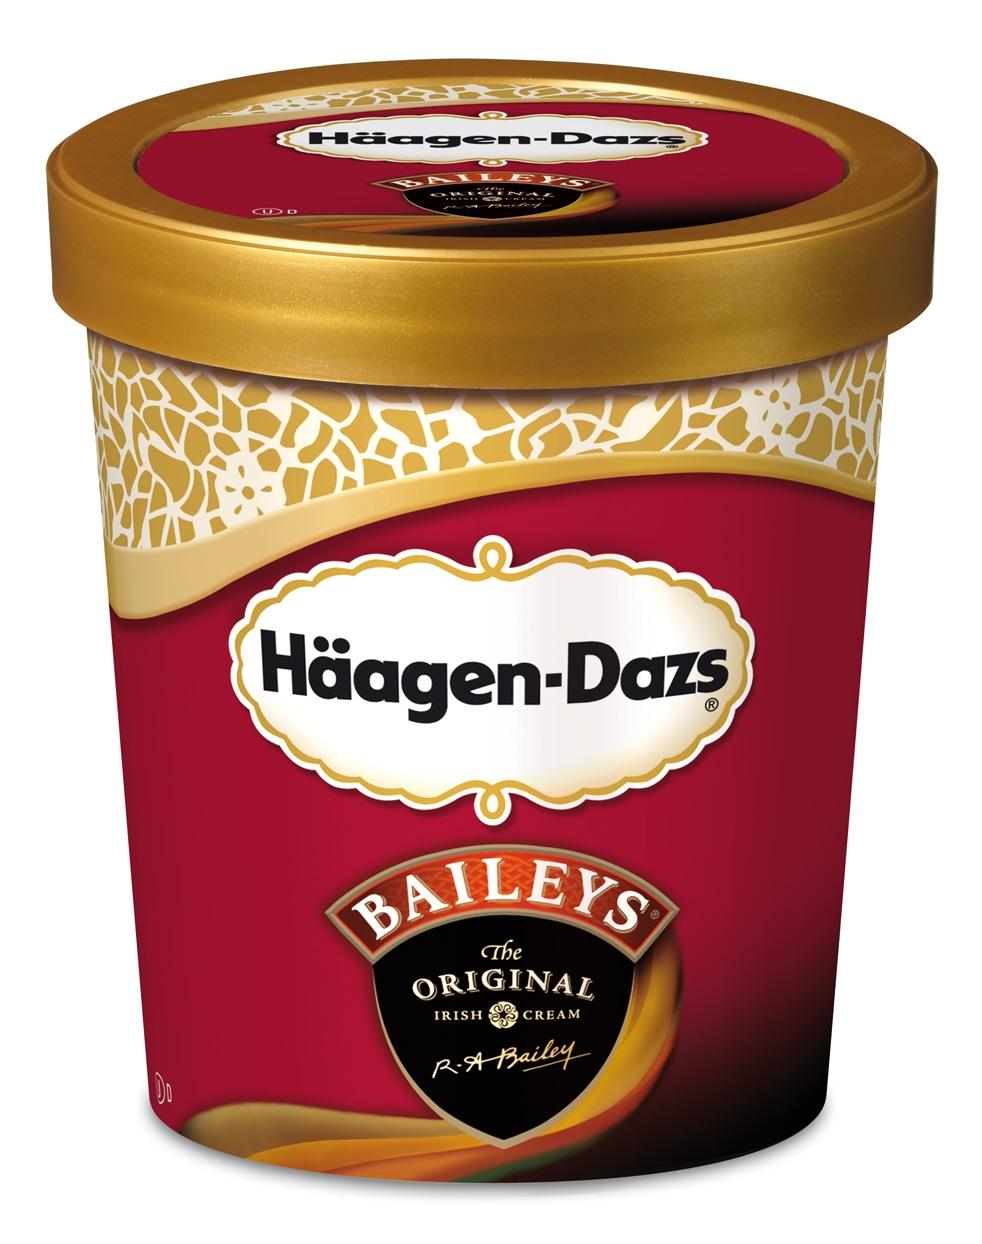 haagan daz Ice cream under every lid, a sweet reward awaits decadent collection banana peanut butter chip.